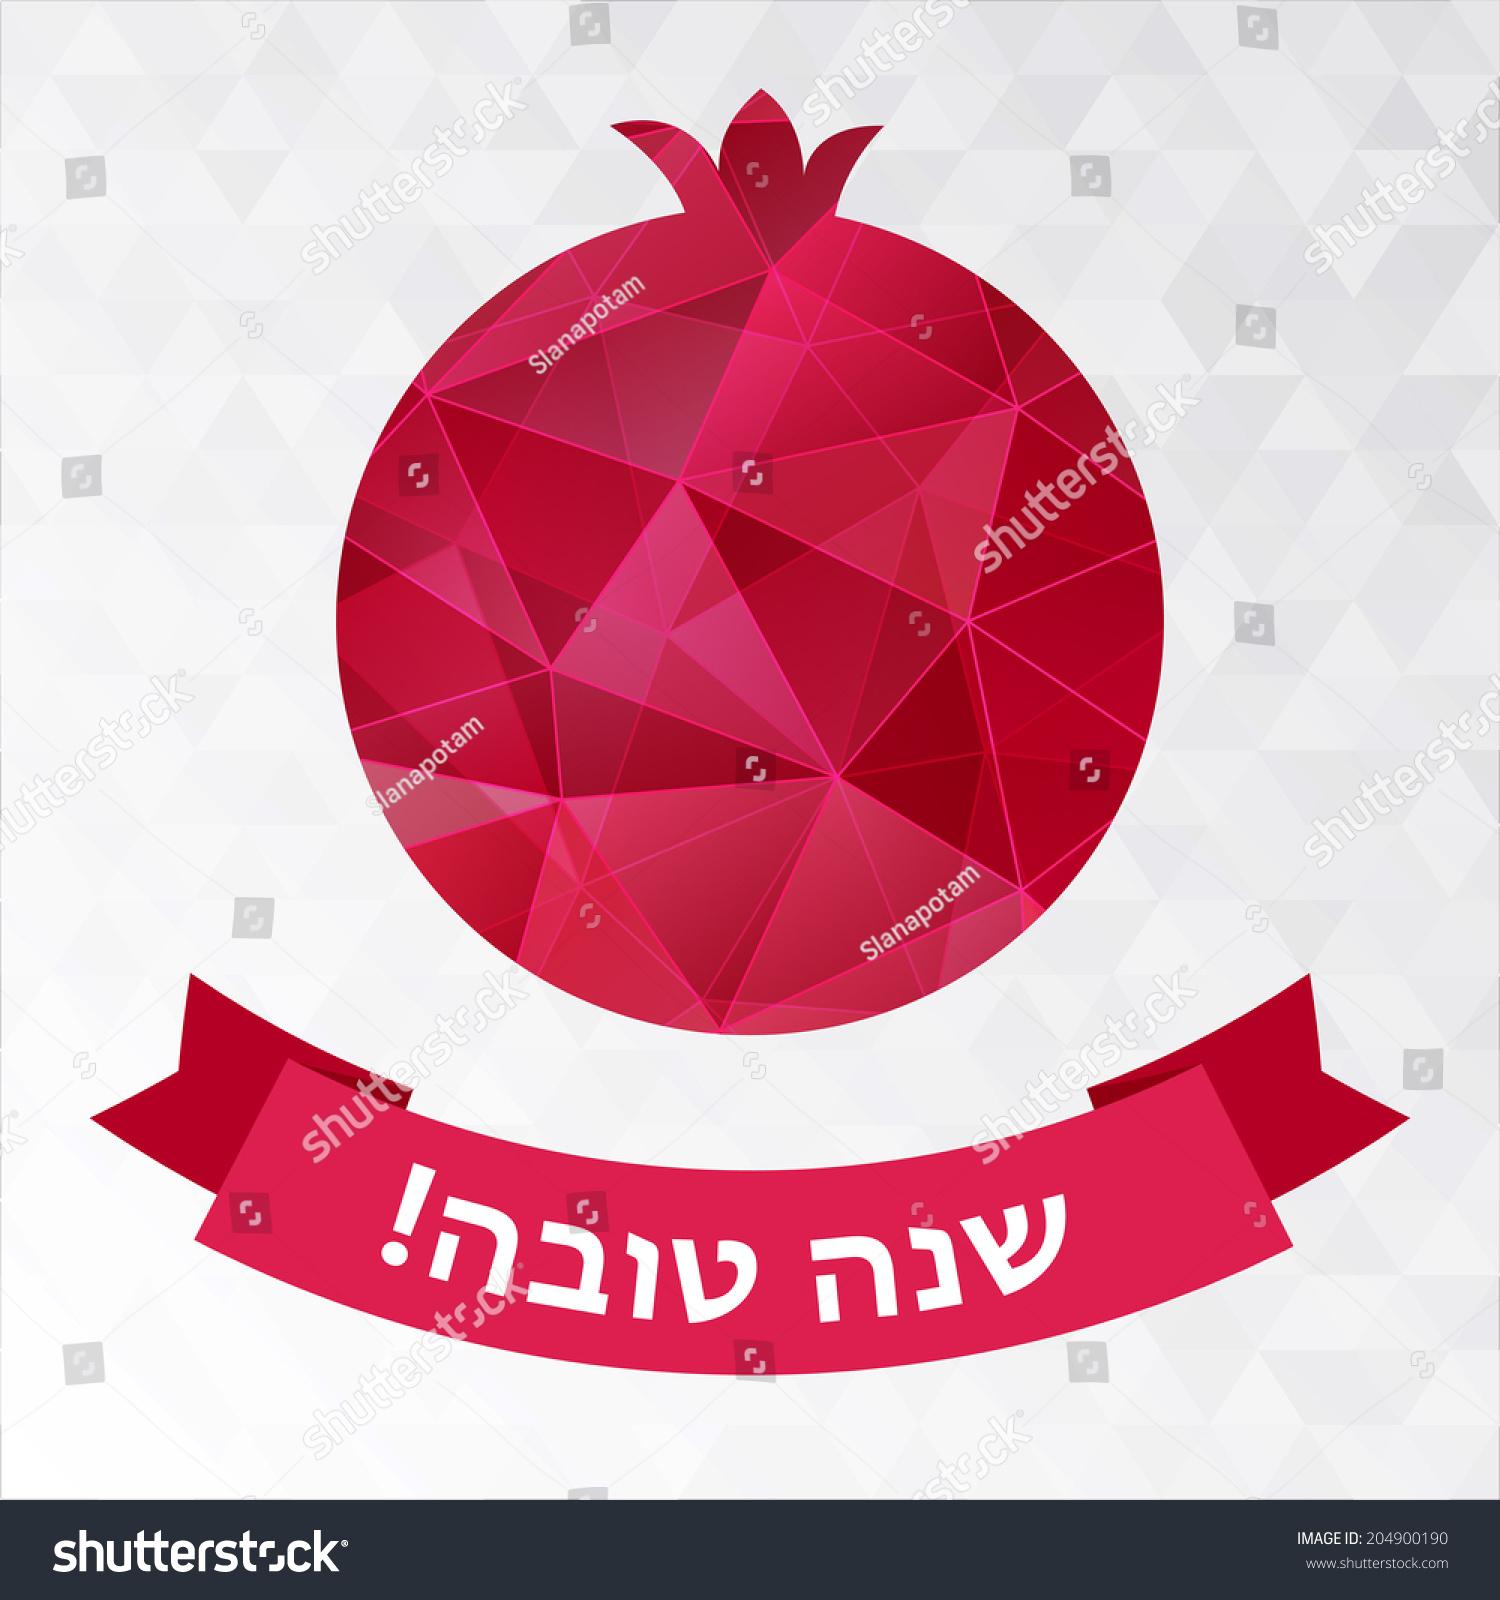 Rosh hashana card jewish new year stock vector 204900190 rosh hashana card jewish new year greeting text shana tova on hebrew have kristyandbryce Images